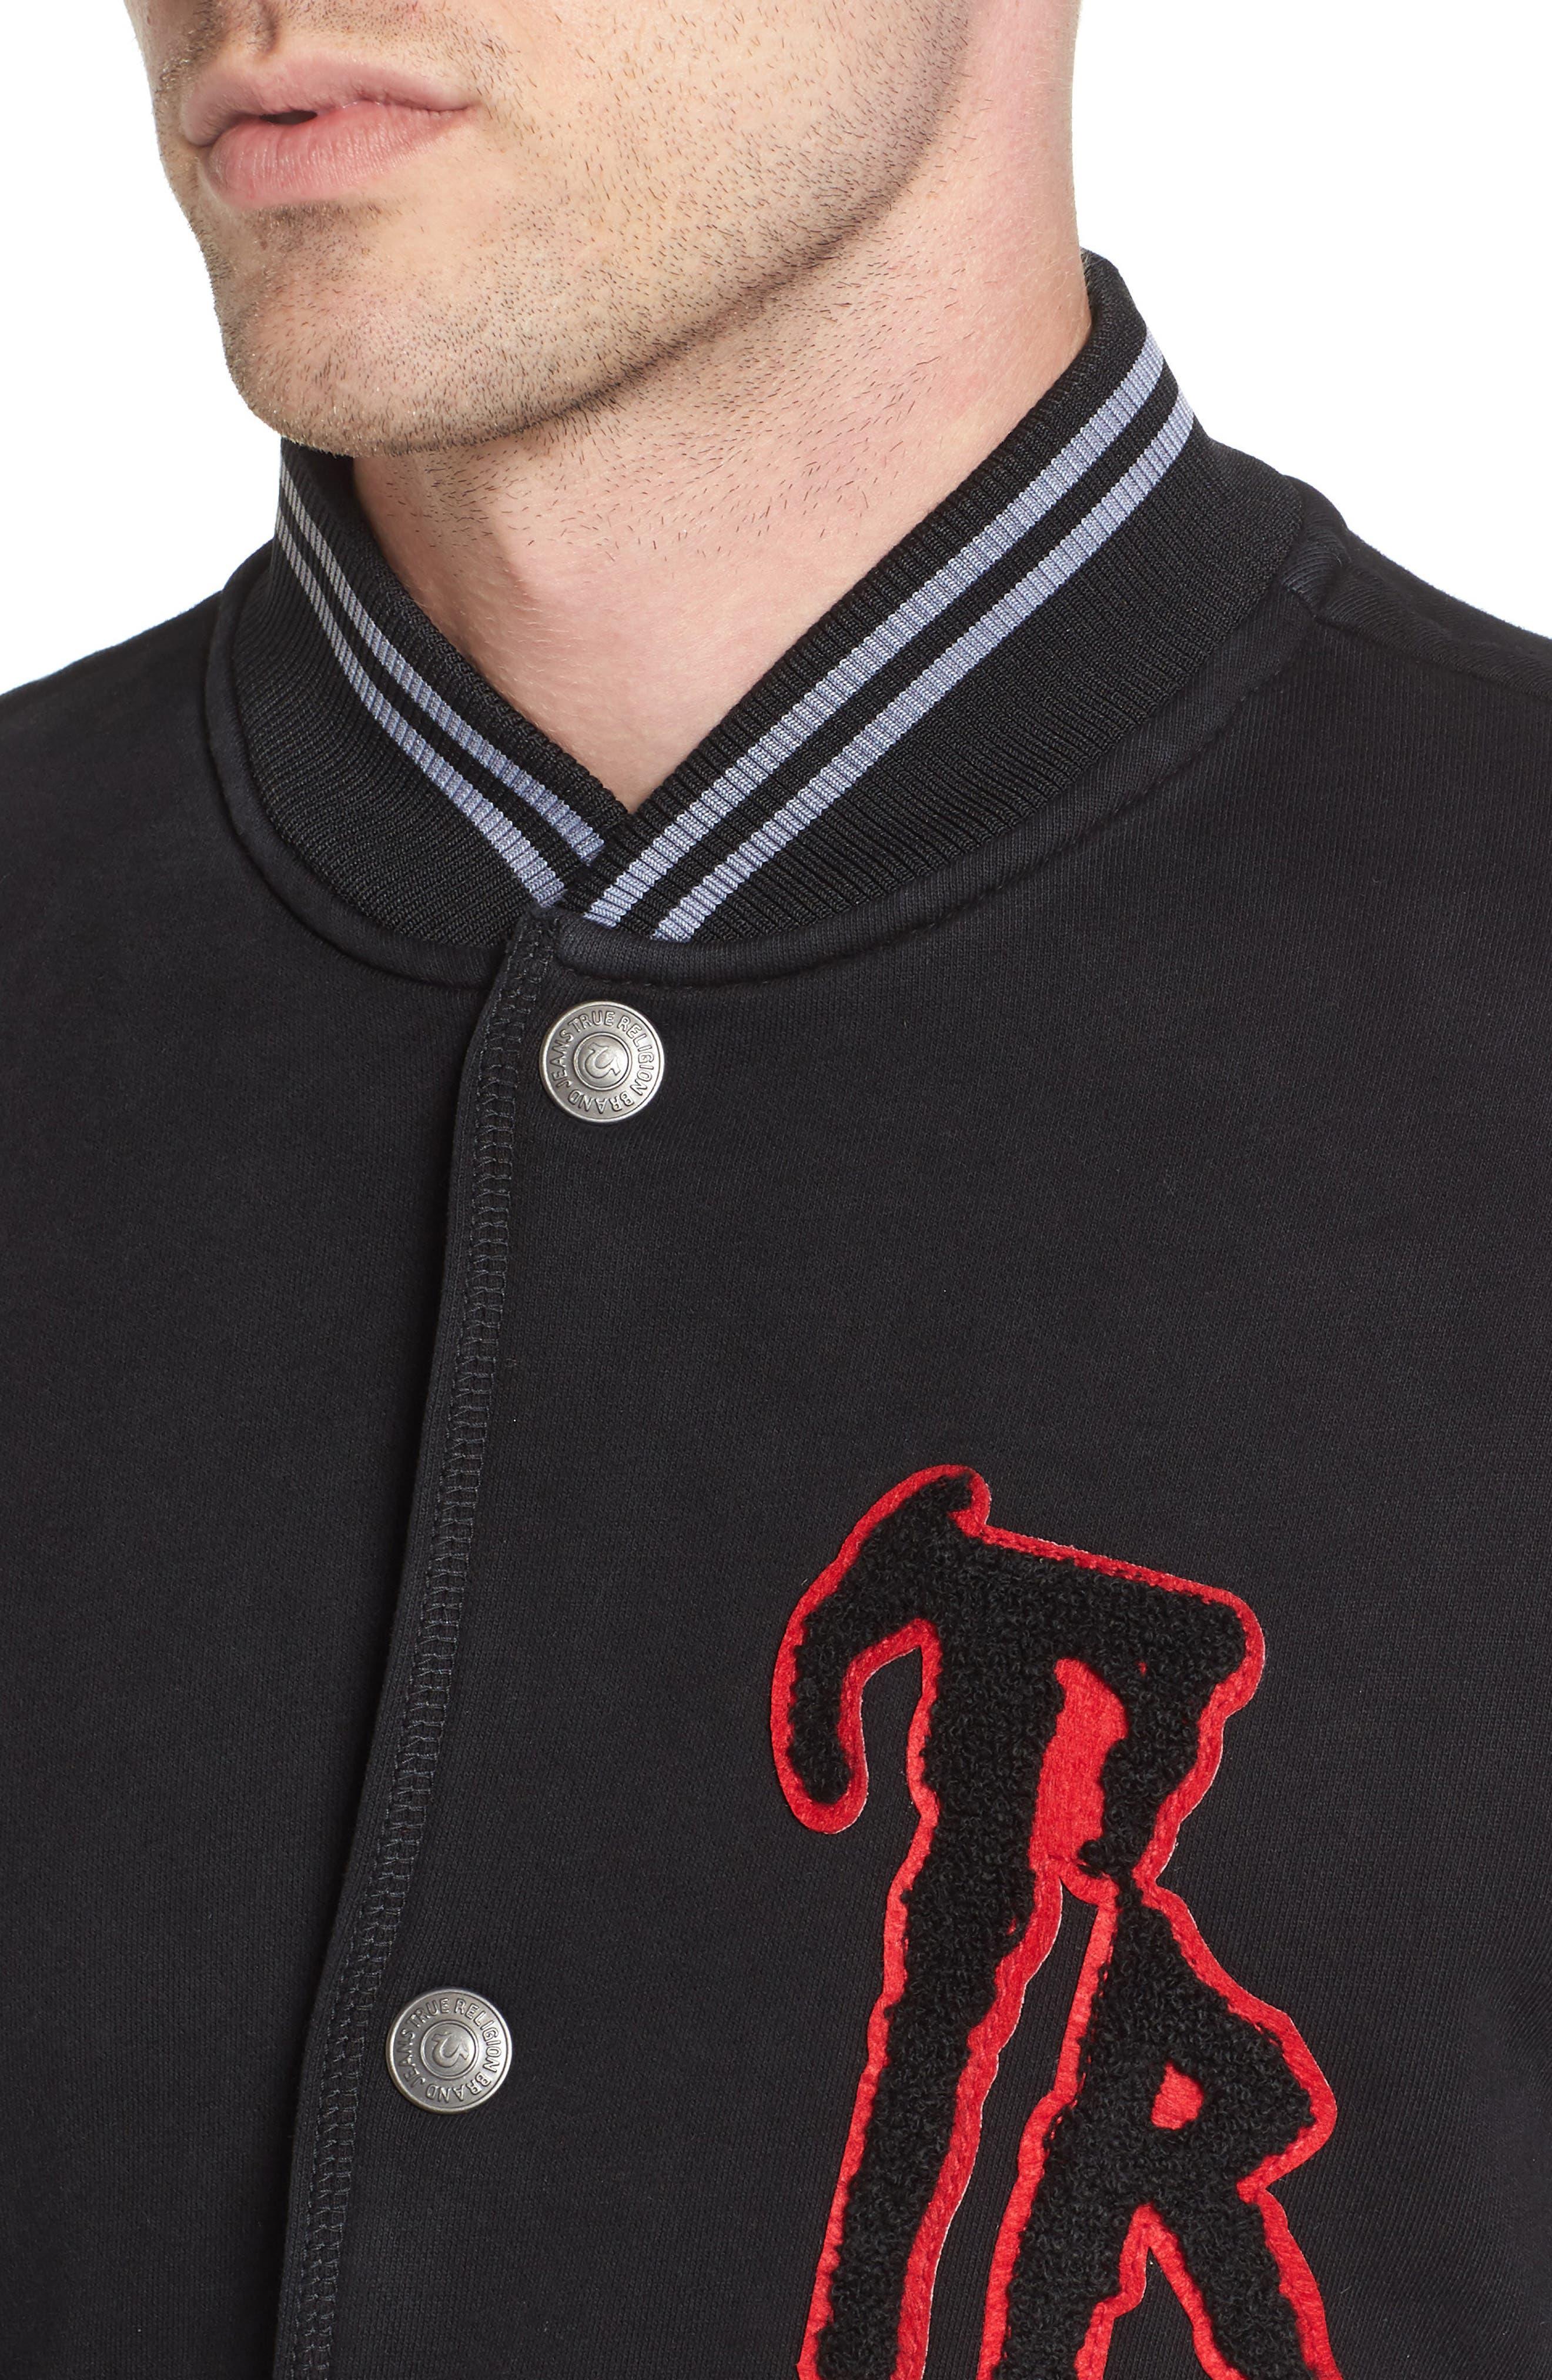 Collegiate Knit Inset Jacket,                             Alternate thumbnail 4, color,